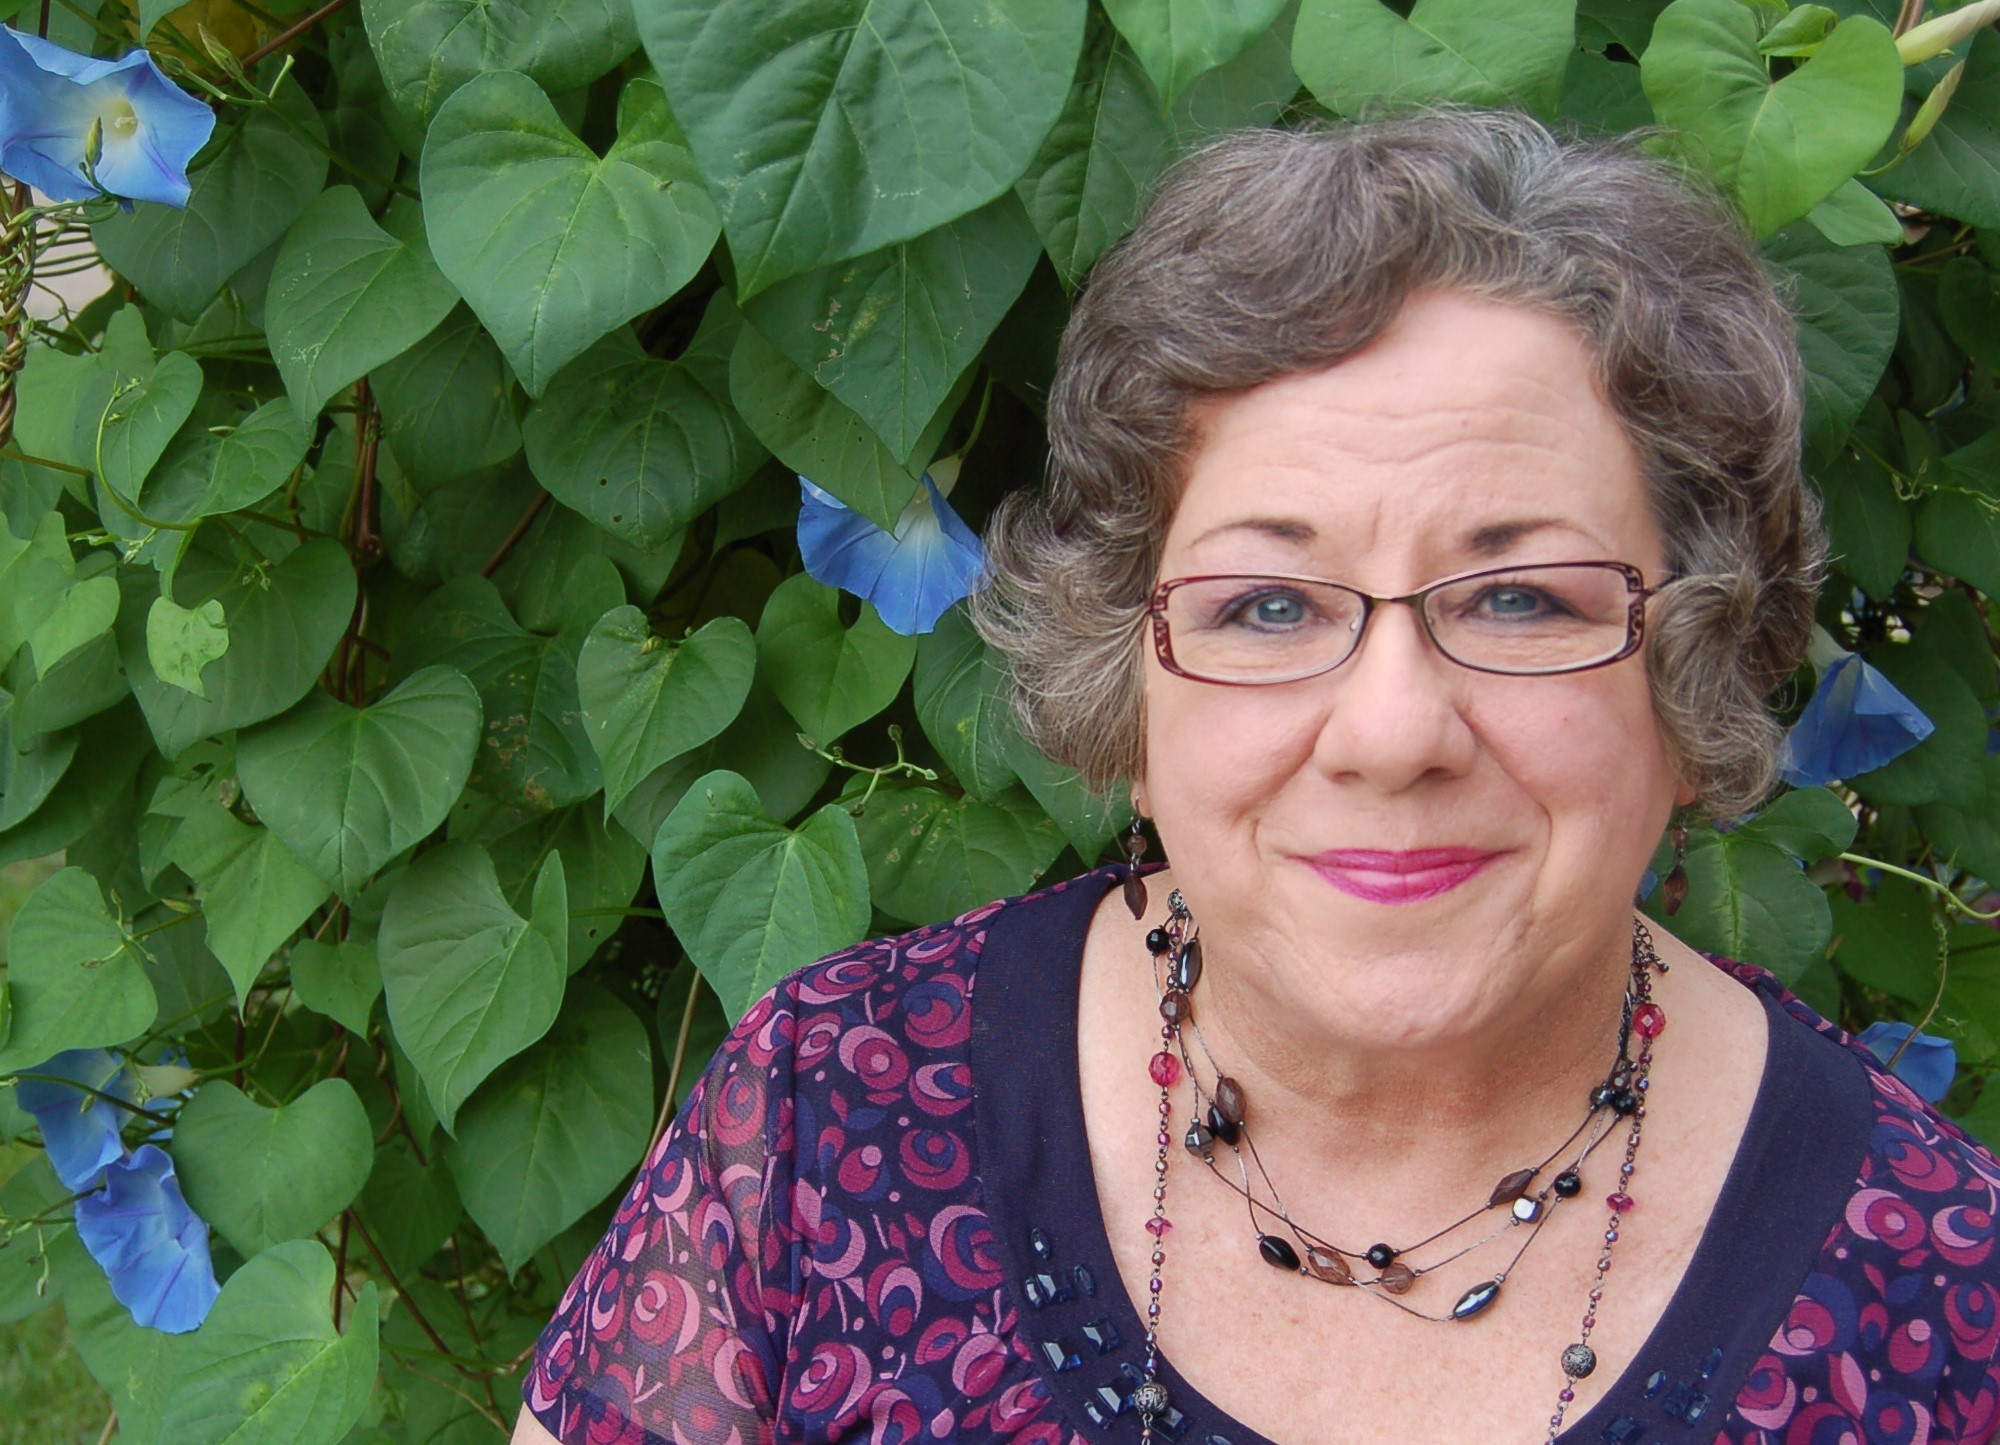 Photograph of Kathy Storrie taken by Aaron Blankenship 2010